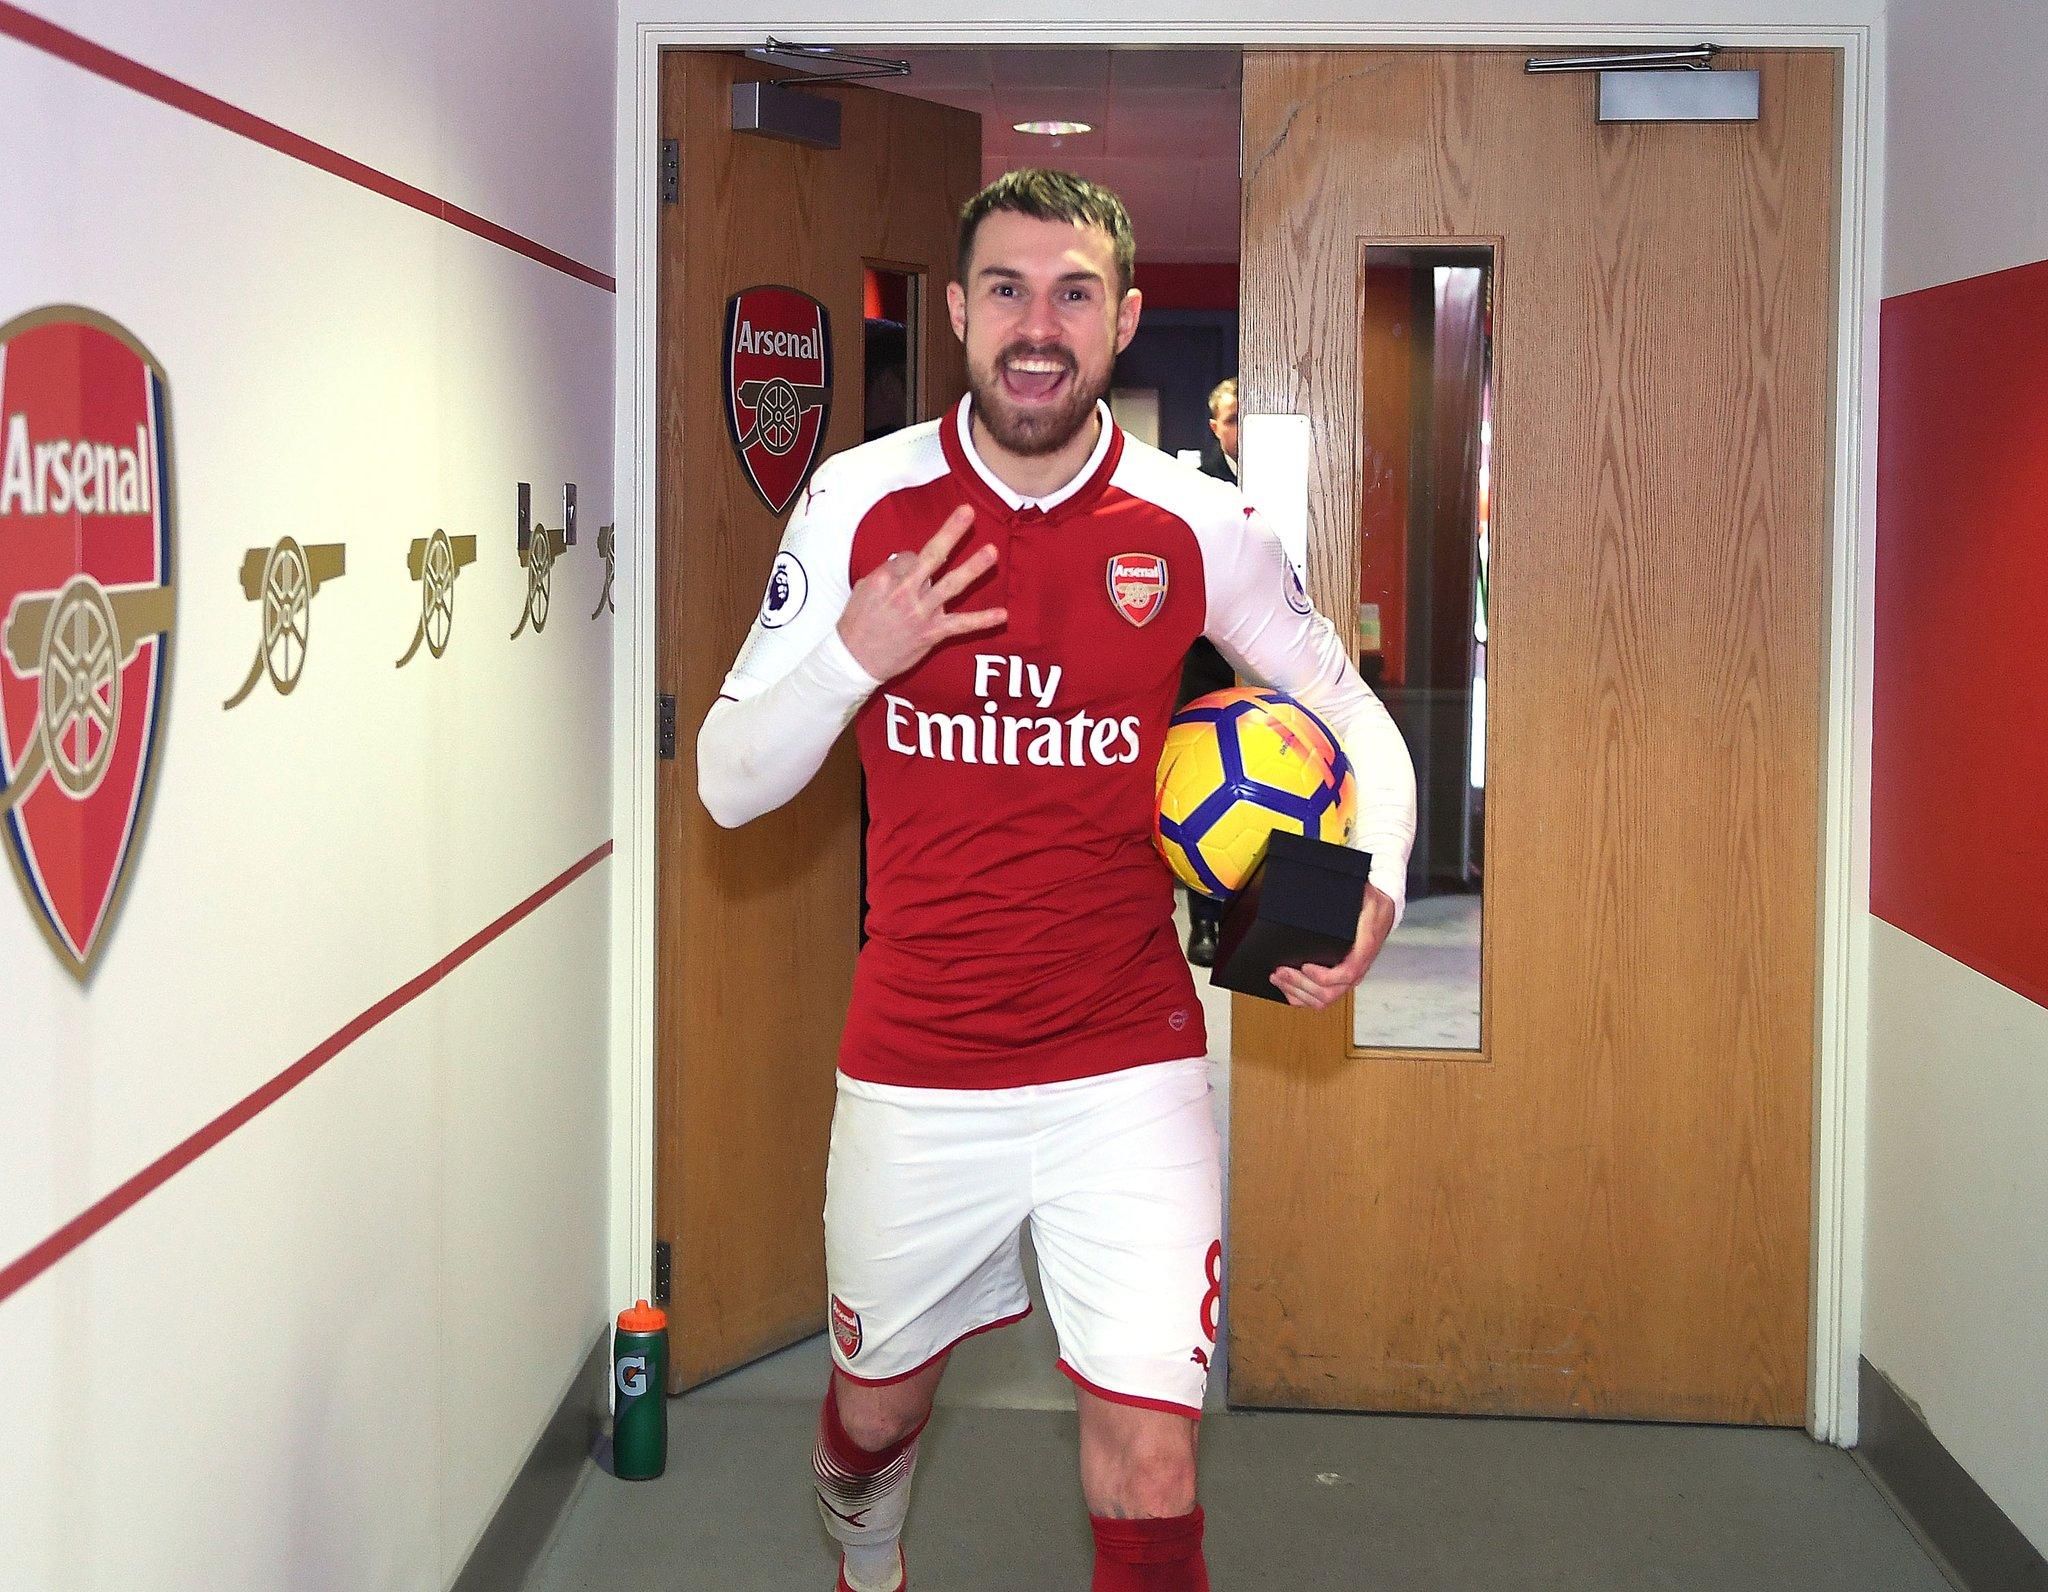 Ramsey baller